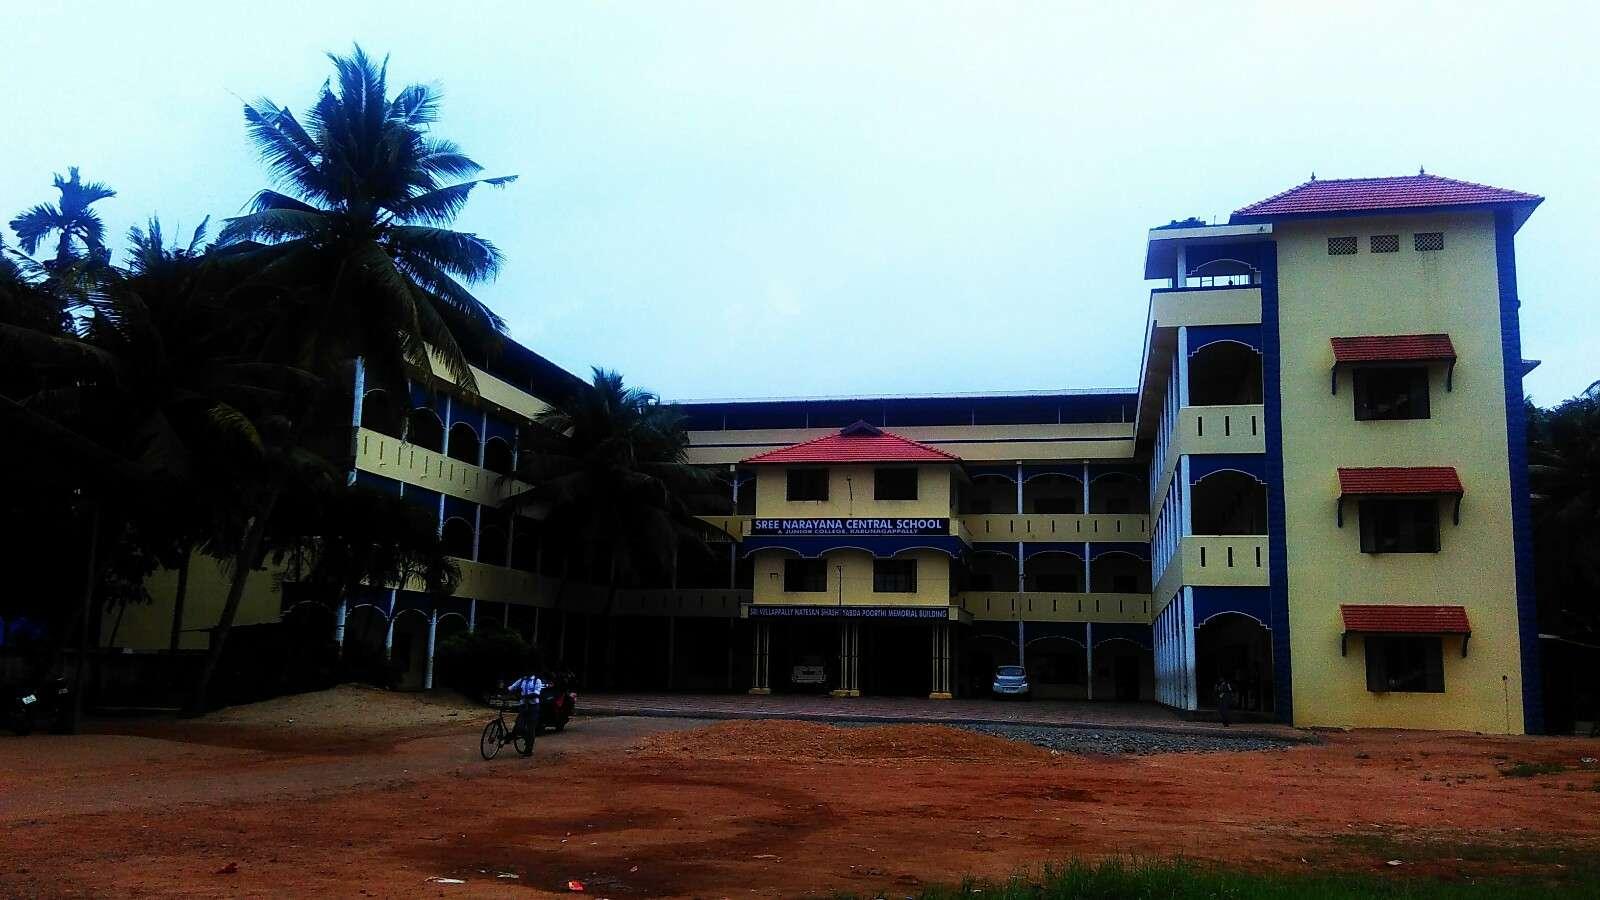 SREE NARAYANA CENTRAL SCHOOL ALUMKADAVU PO KARUNAGAPPALLY KOLLAM DISTT KERALA 930487